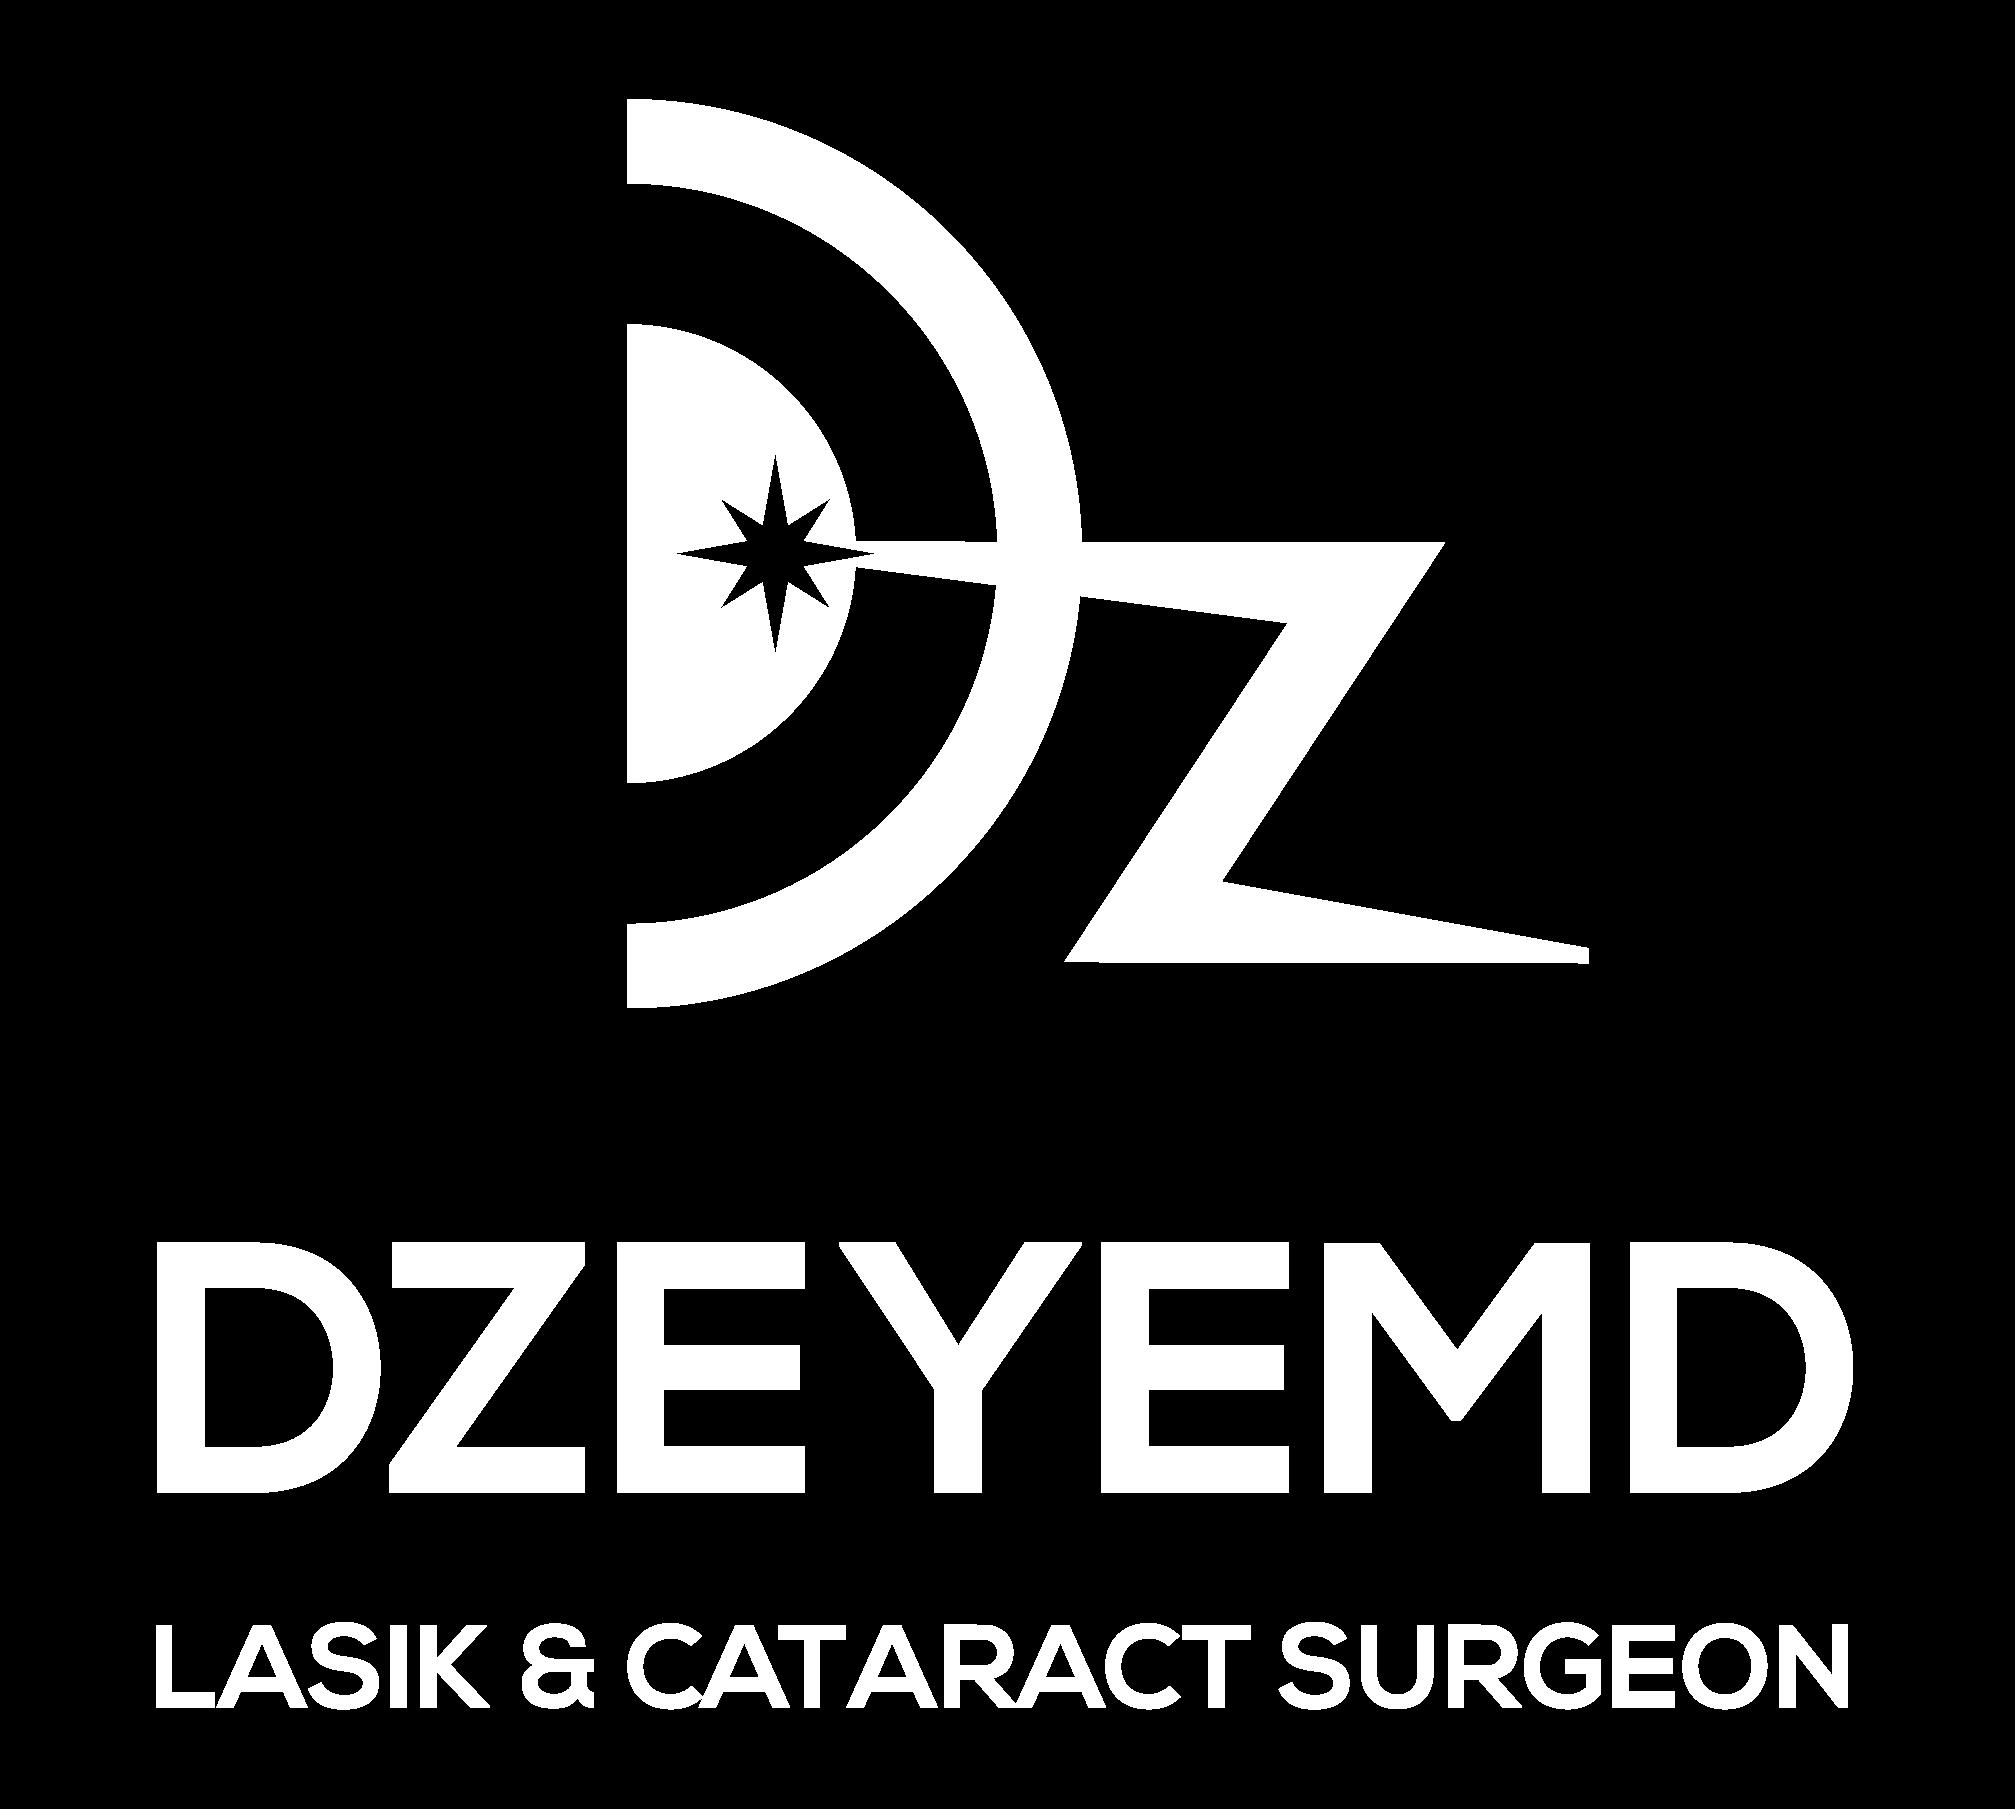 DAGNY ZHU, M.D.